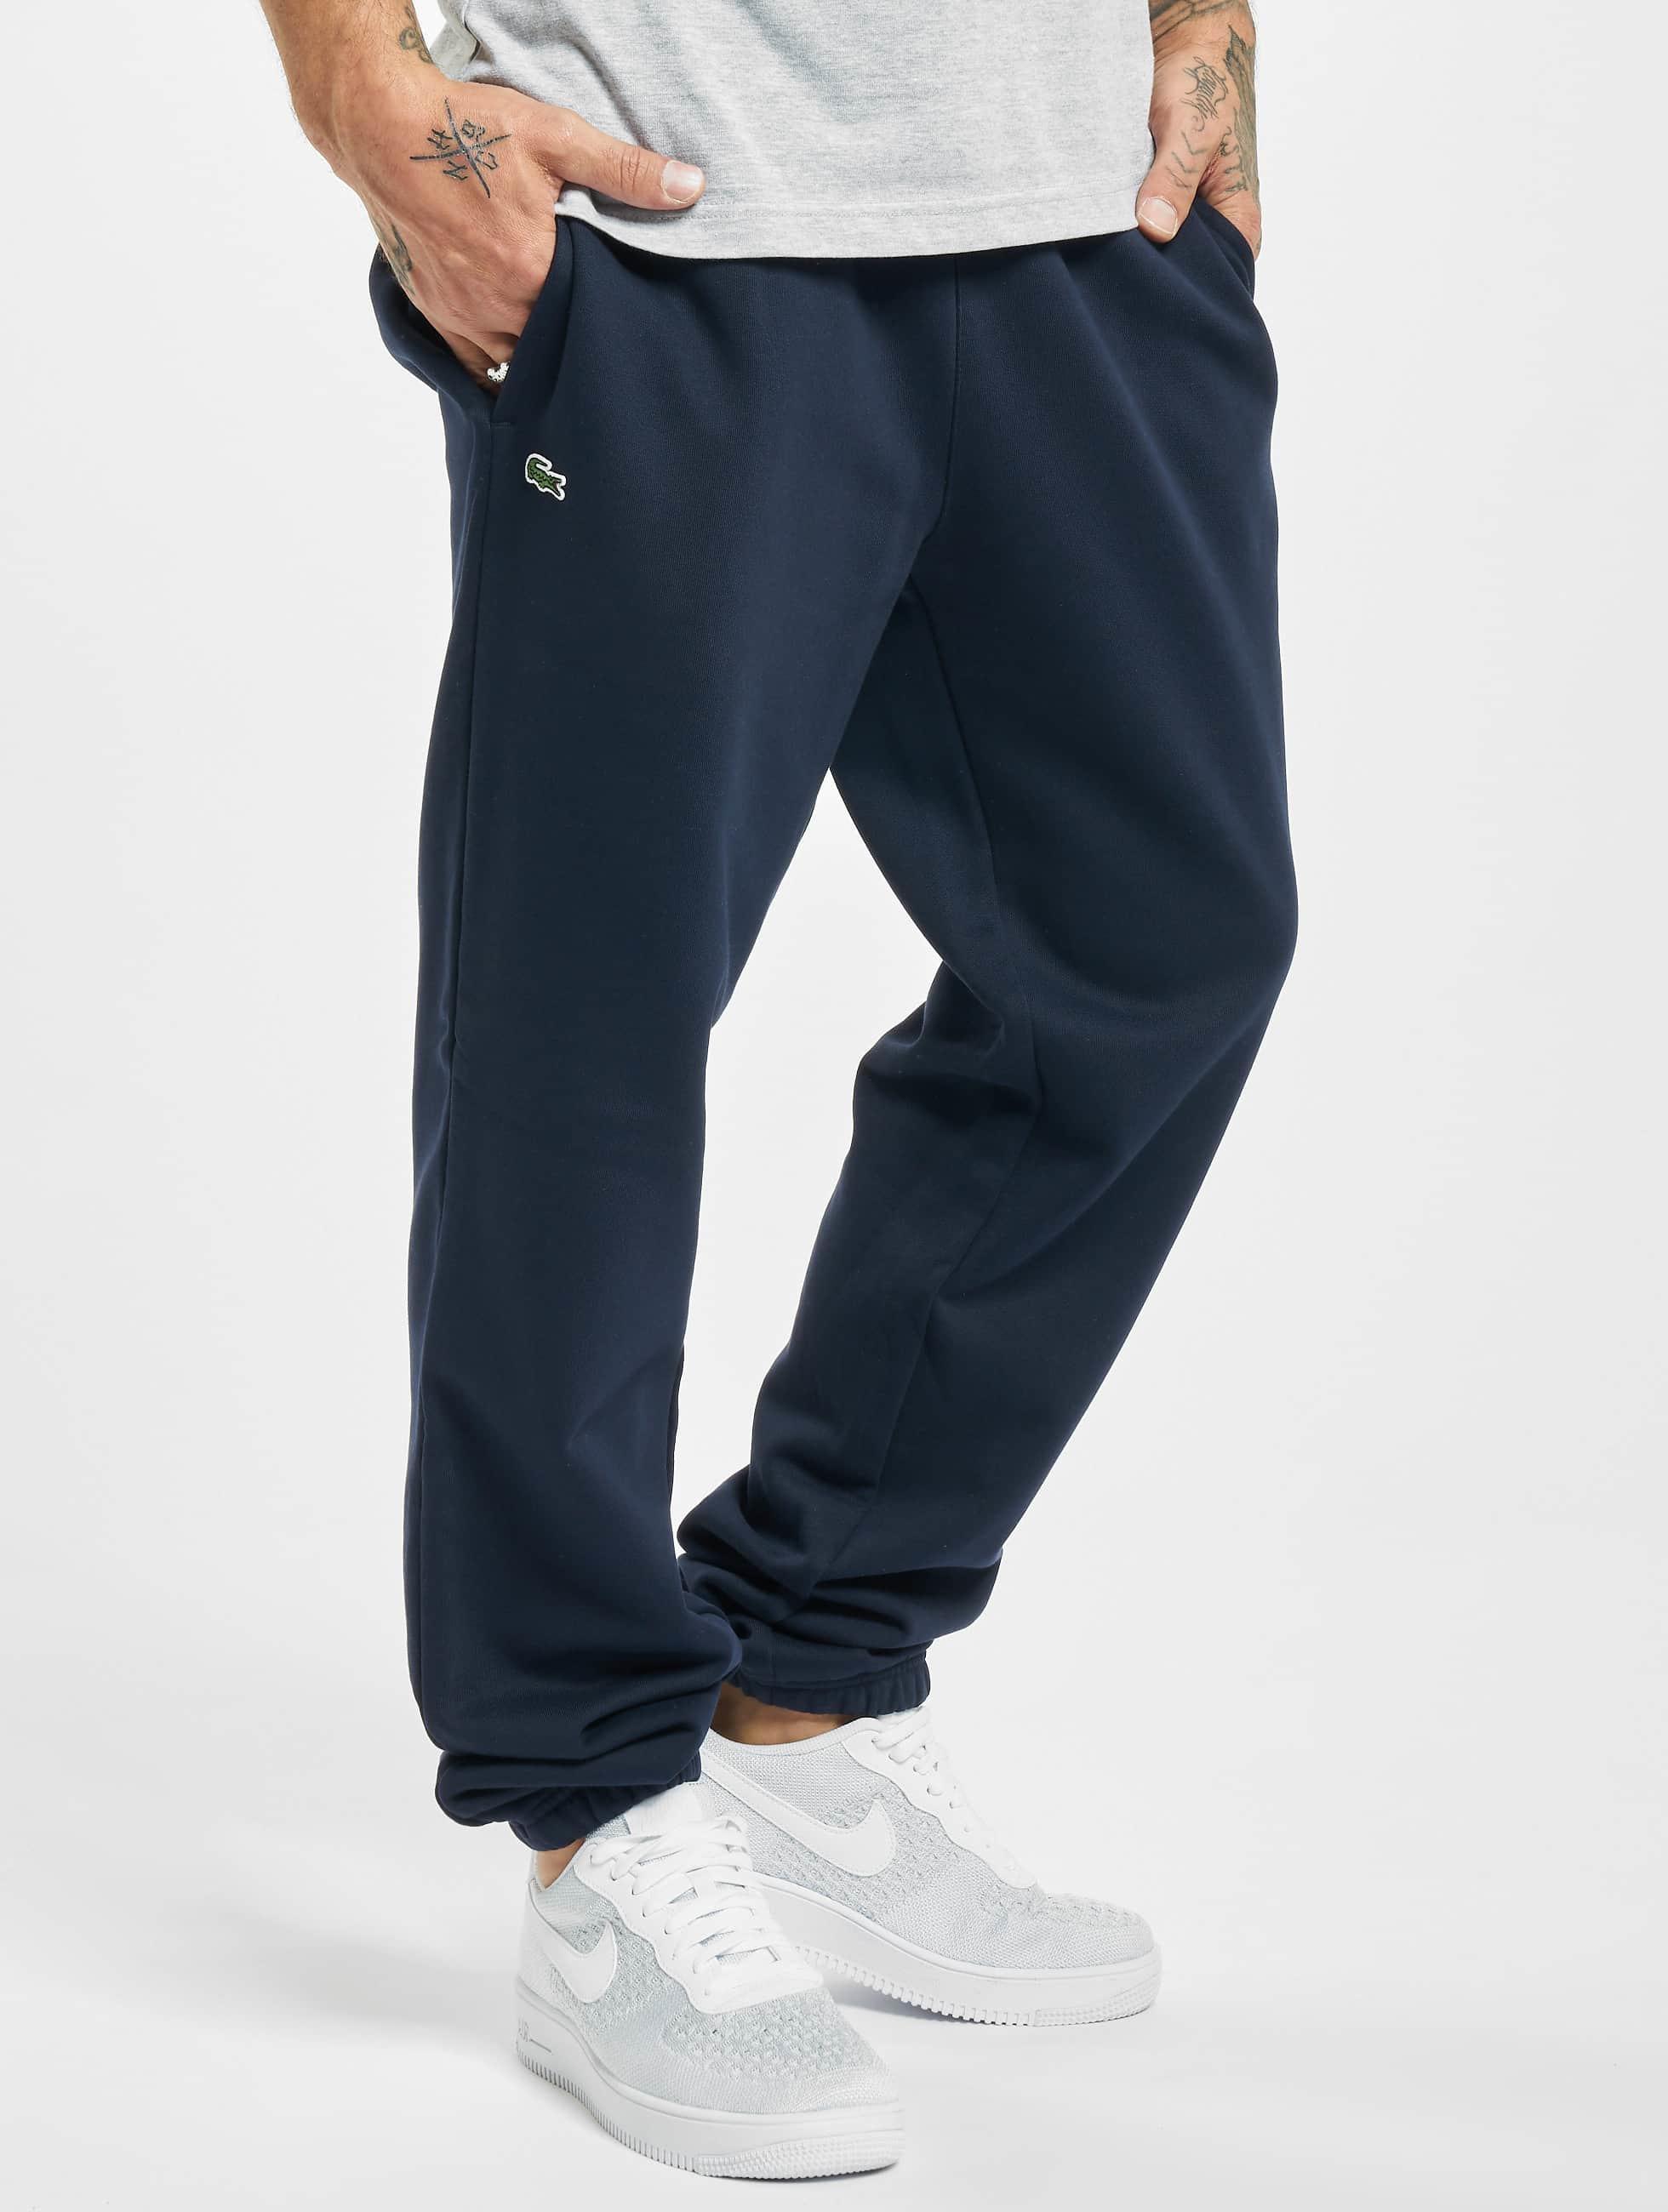 Lacoste Classic Männer Jogginghose Classic in blau